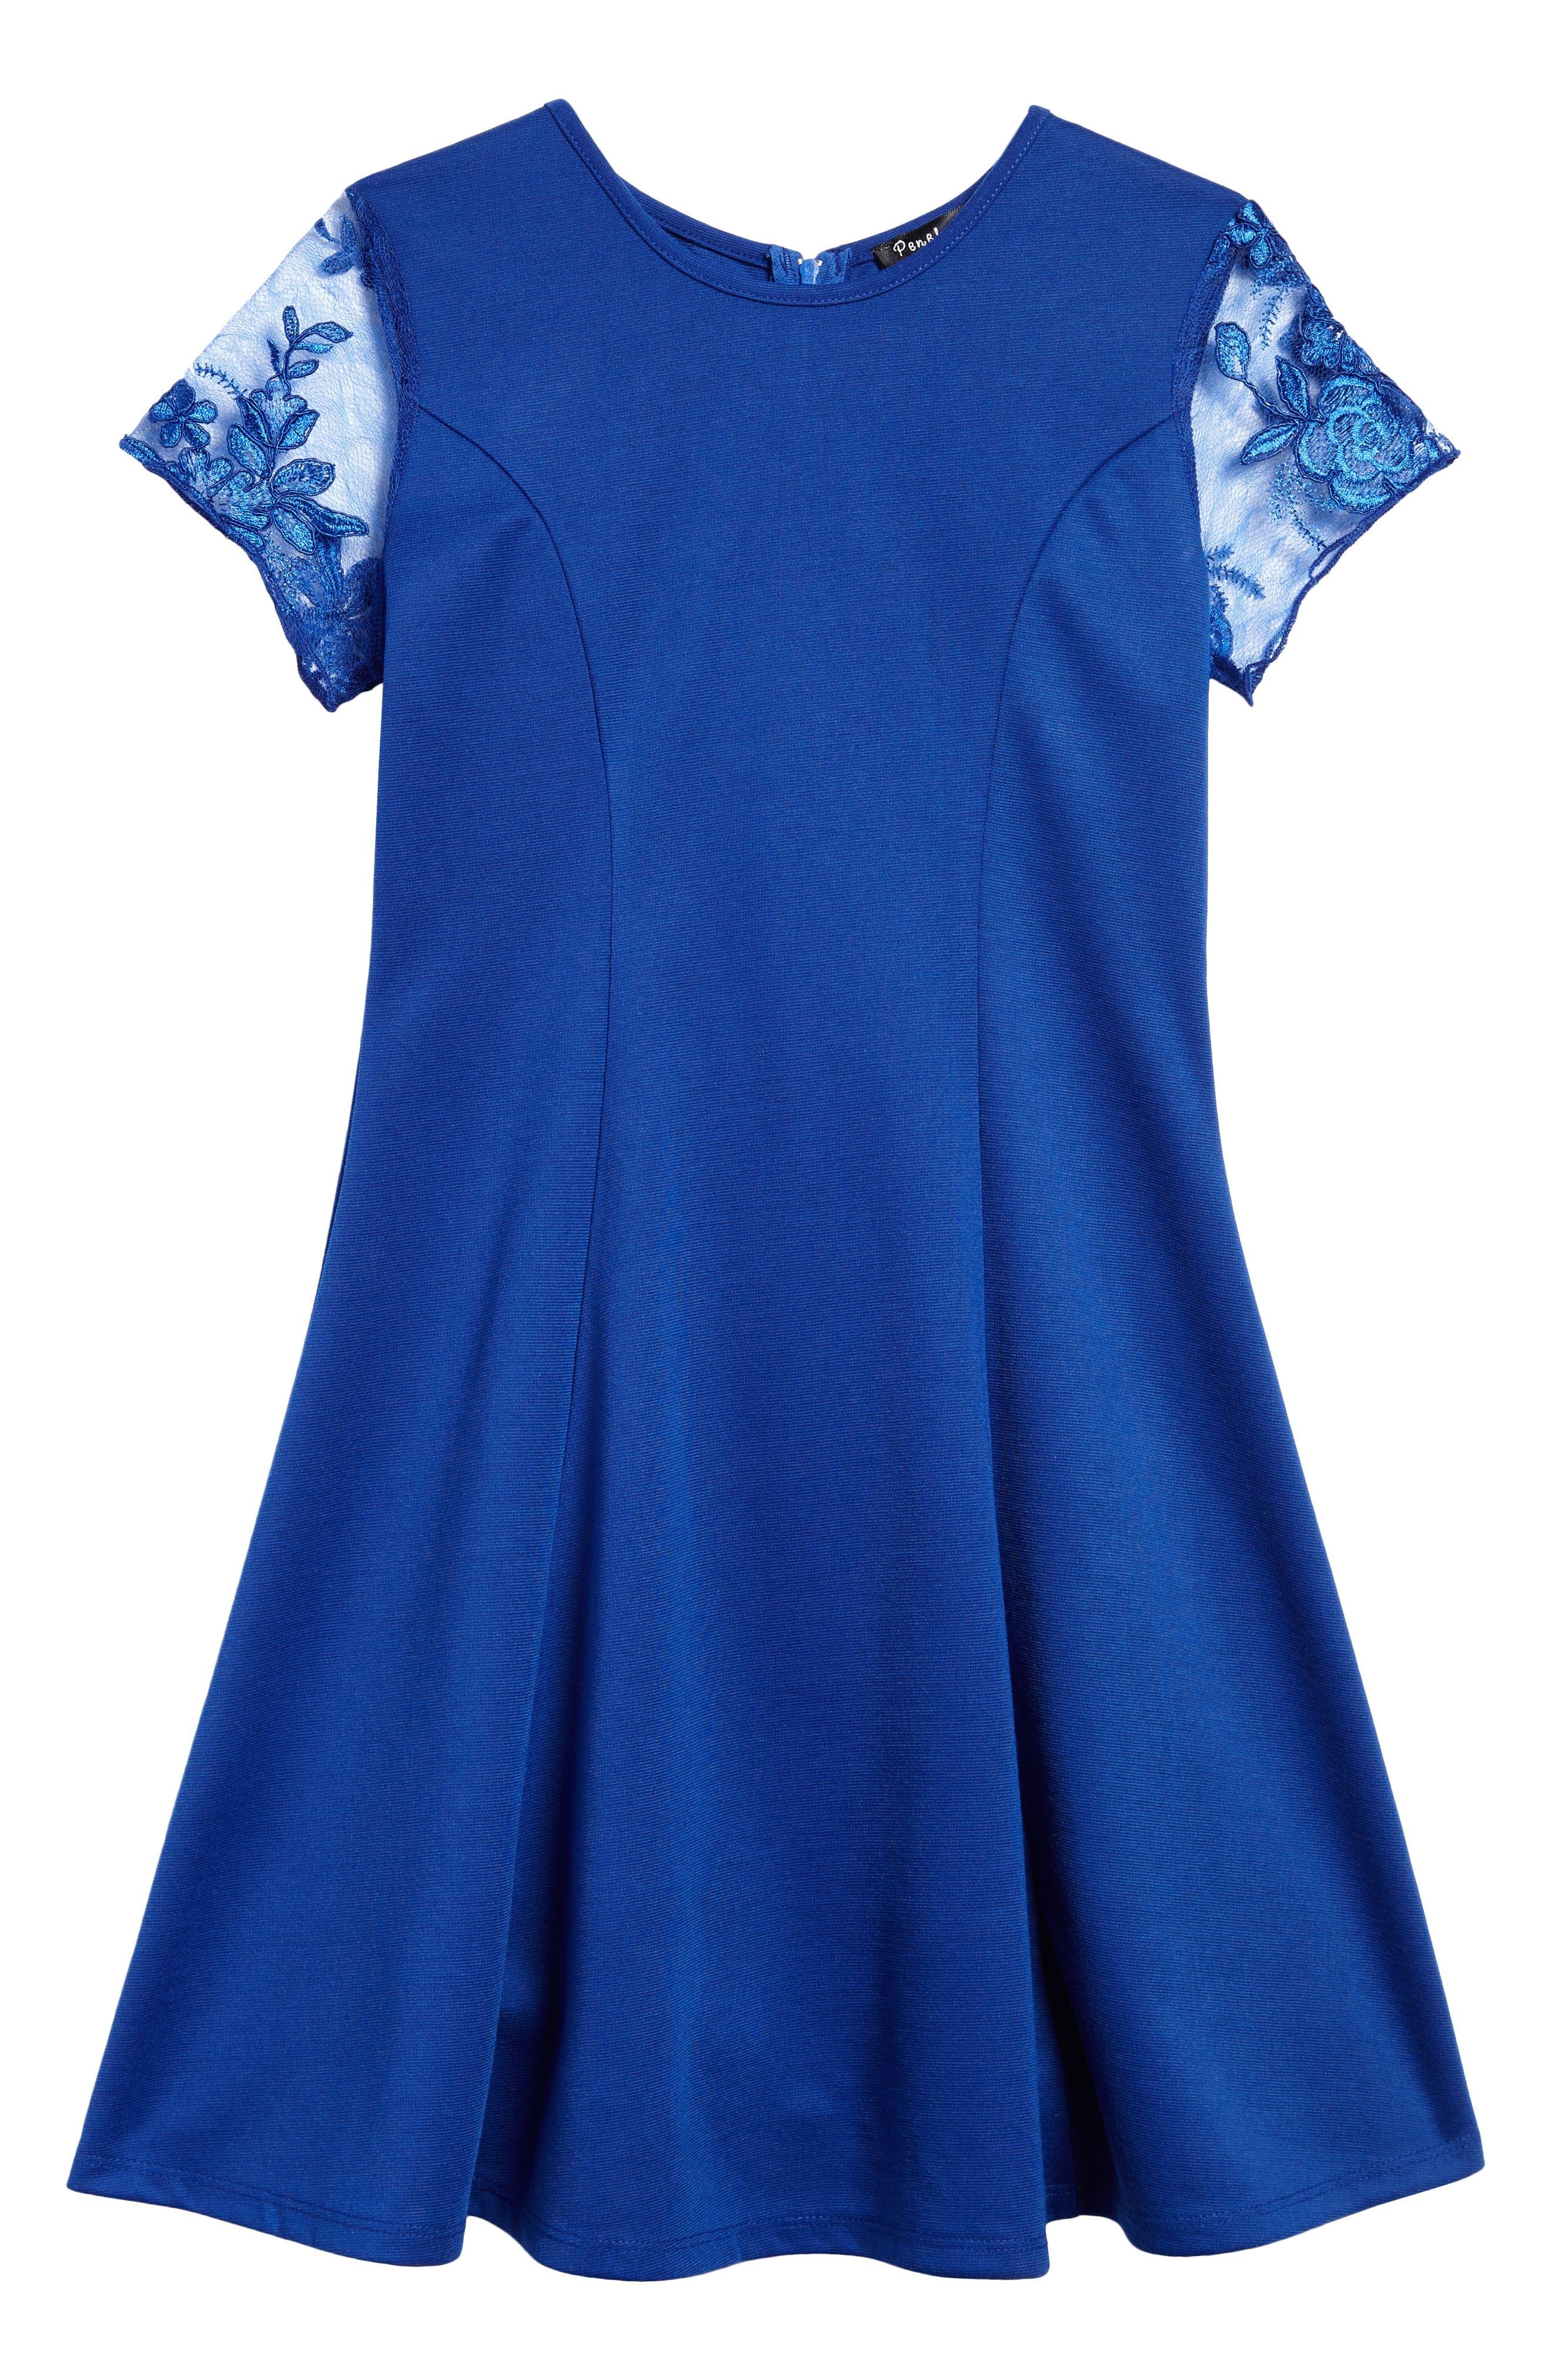 Priscilla Lace Sleeve Dress,                             Main thumbnail 1, color,